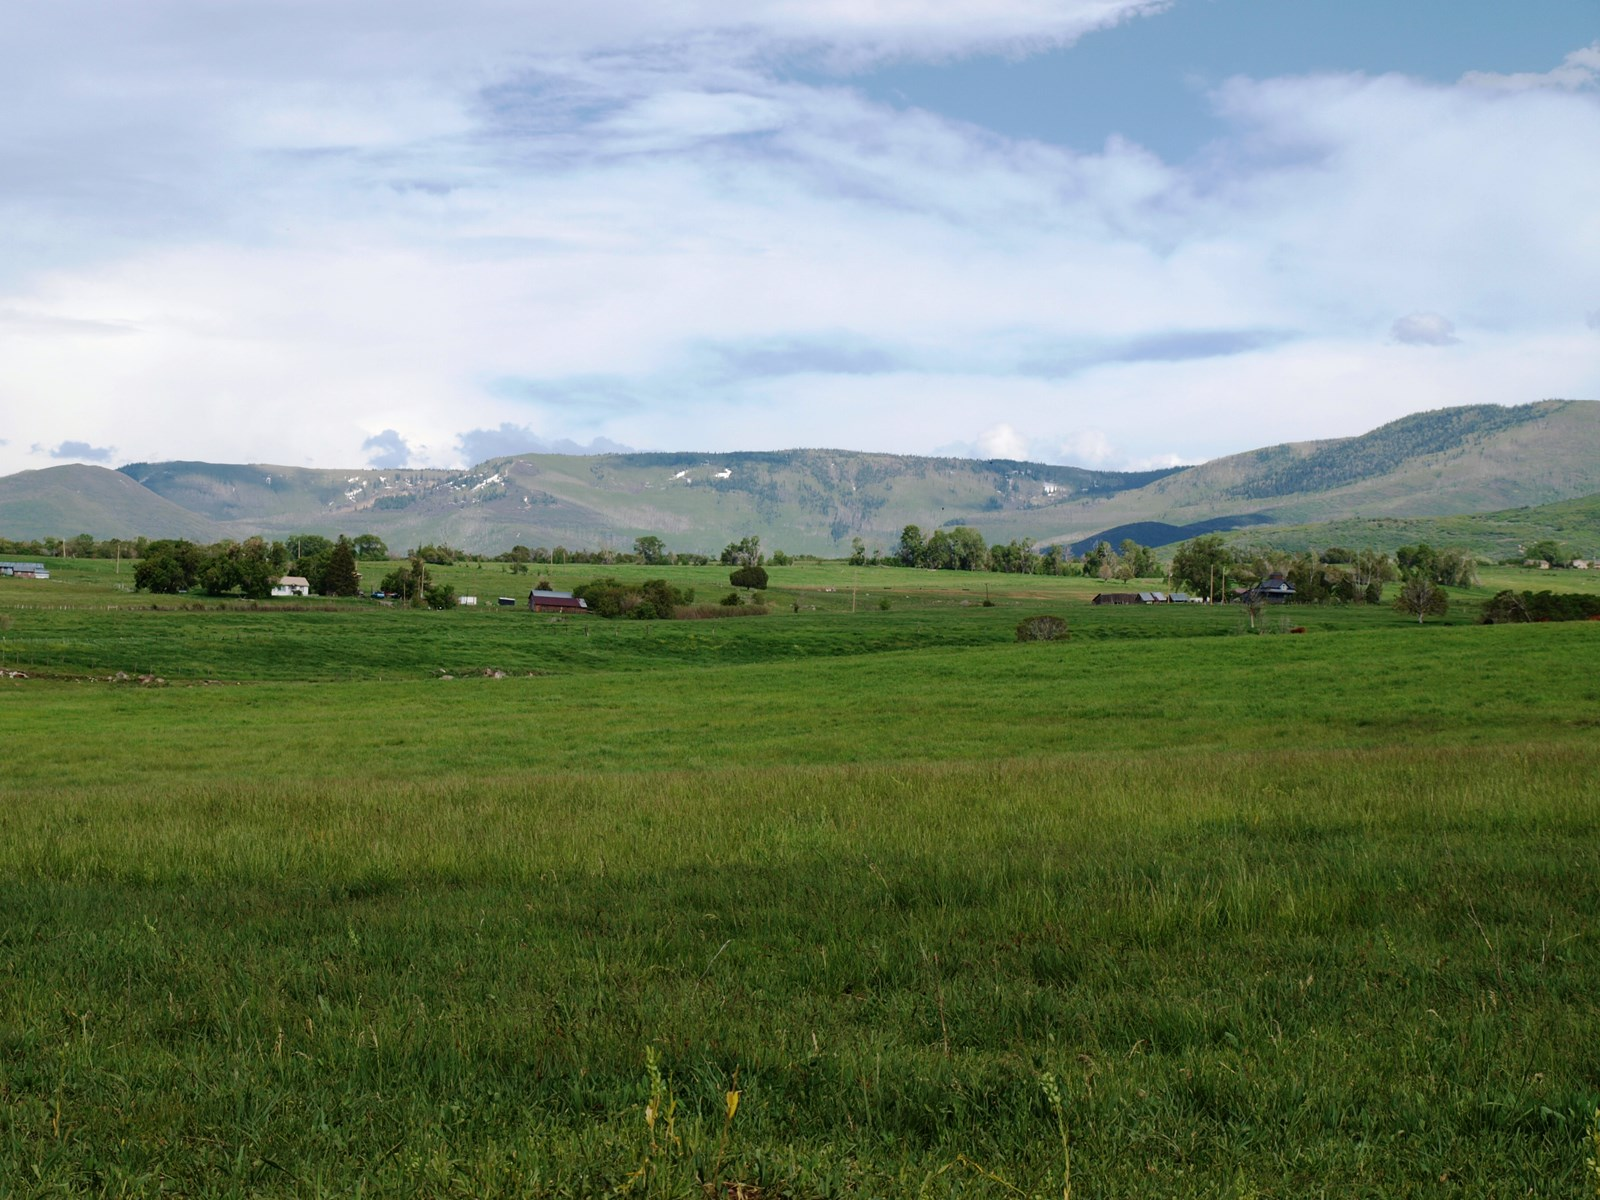 Western Colorado Recreational Land For Sale